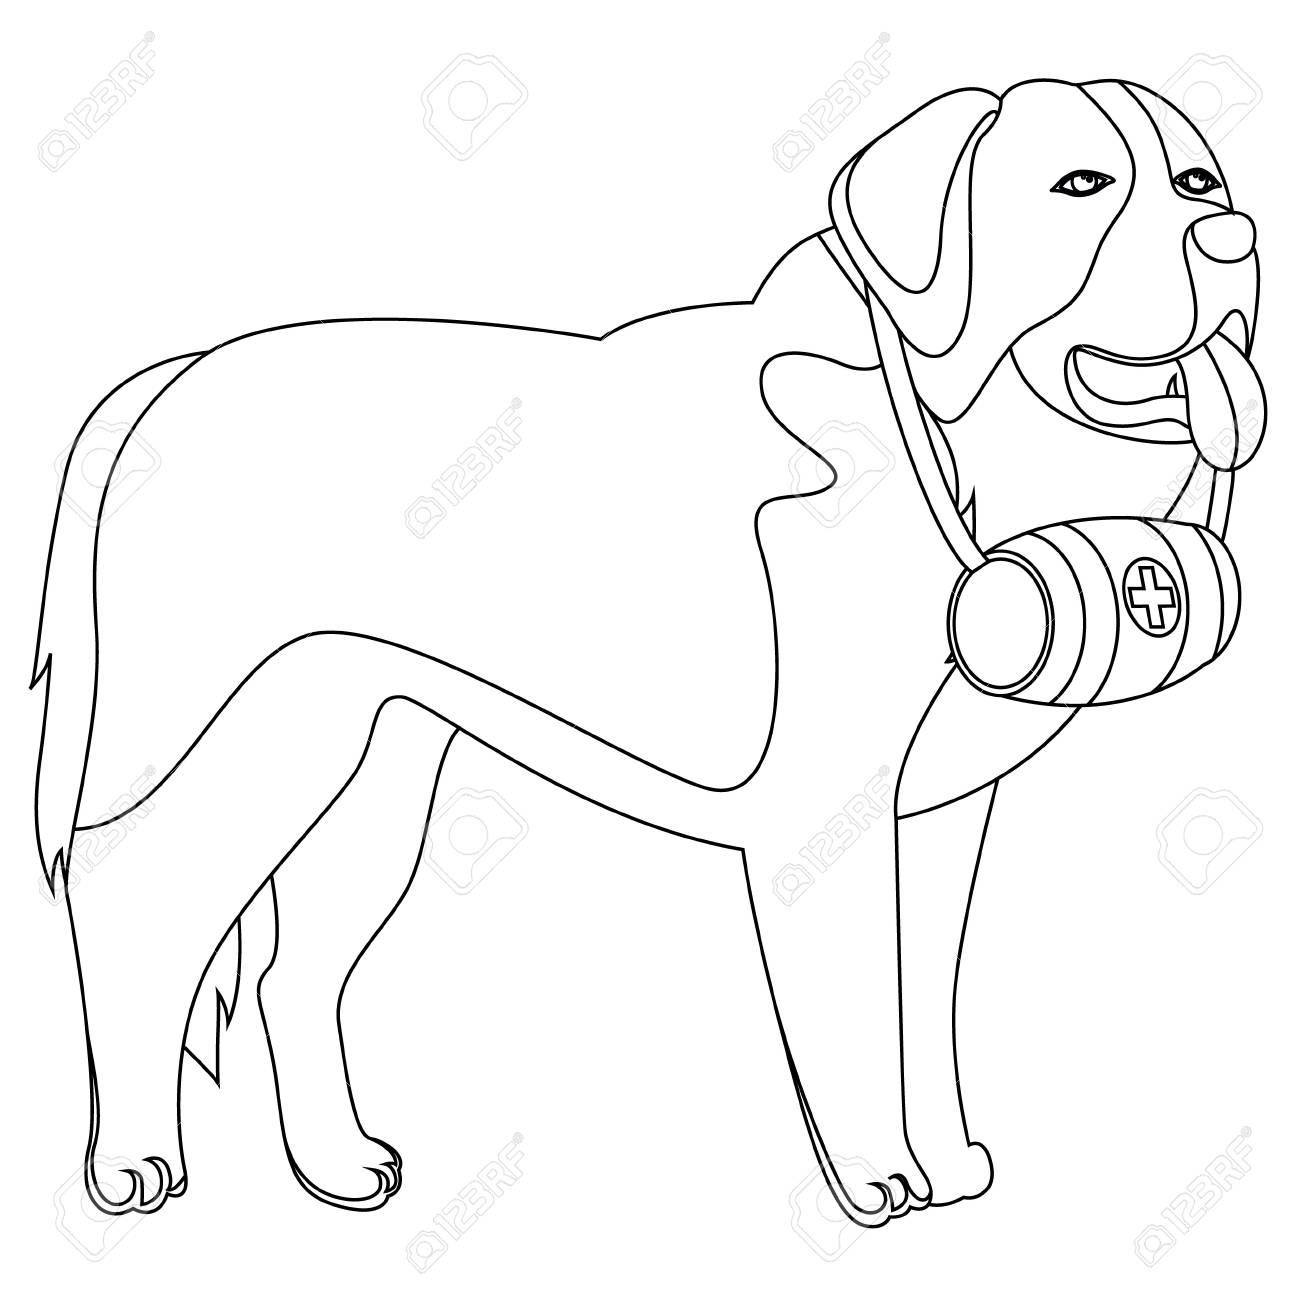 1300x1300 St Bernard Dog Lifesaver Outline Vector Illustration Royalty Free